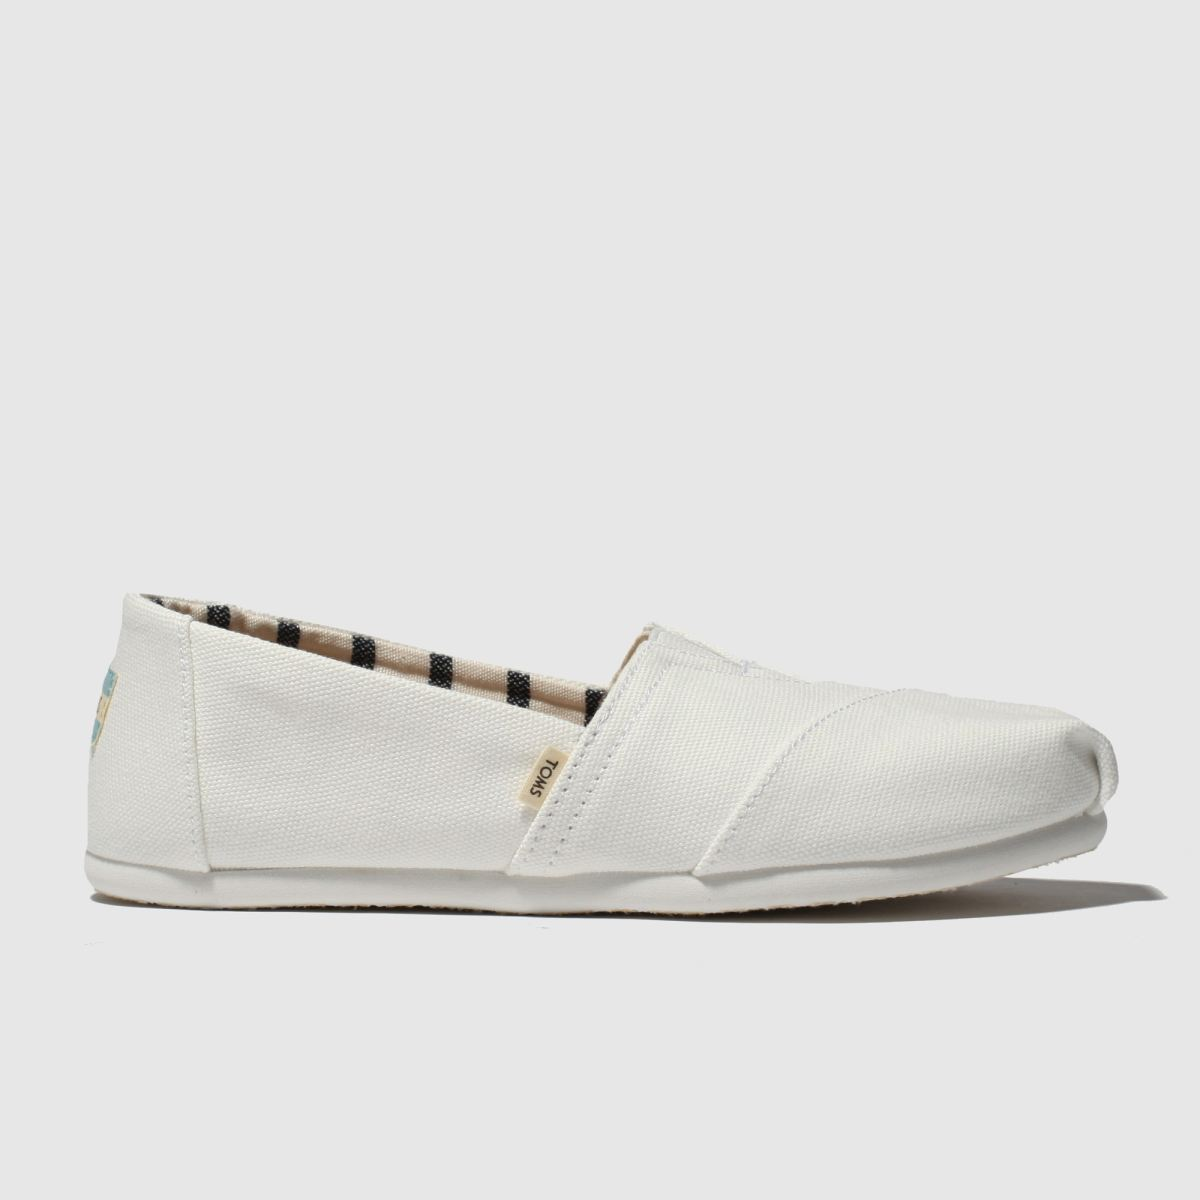 Toms White Alpargata Venice Flat Shoes